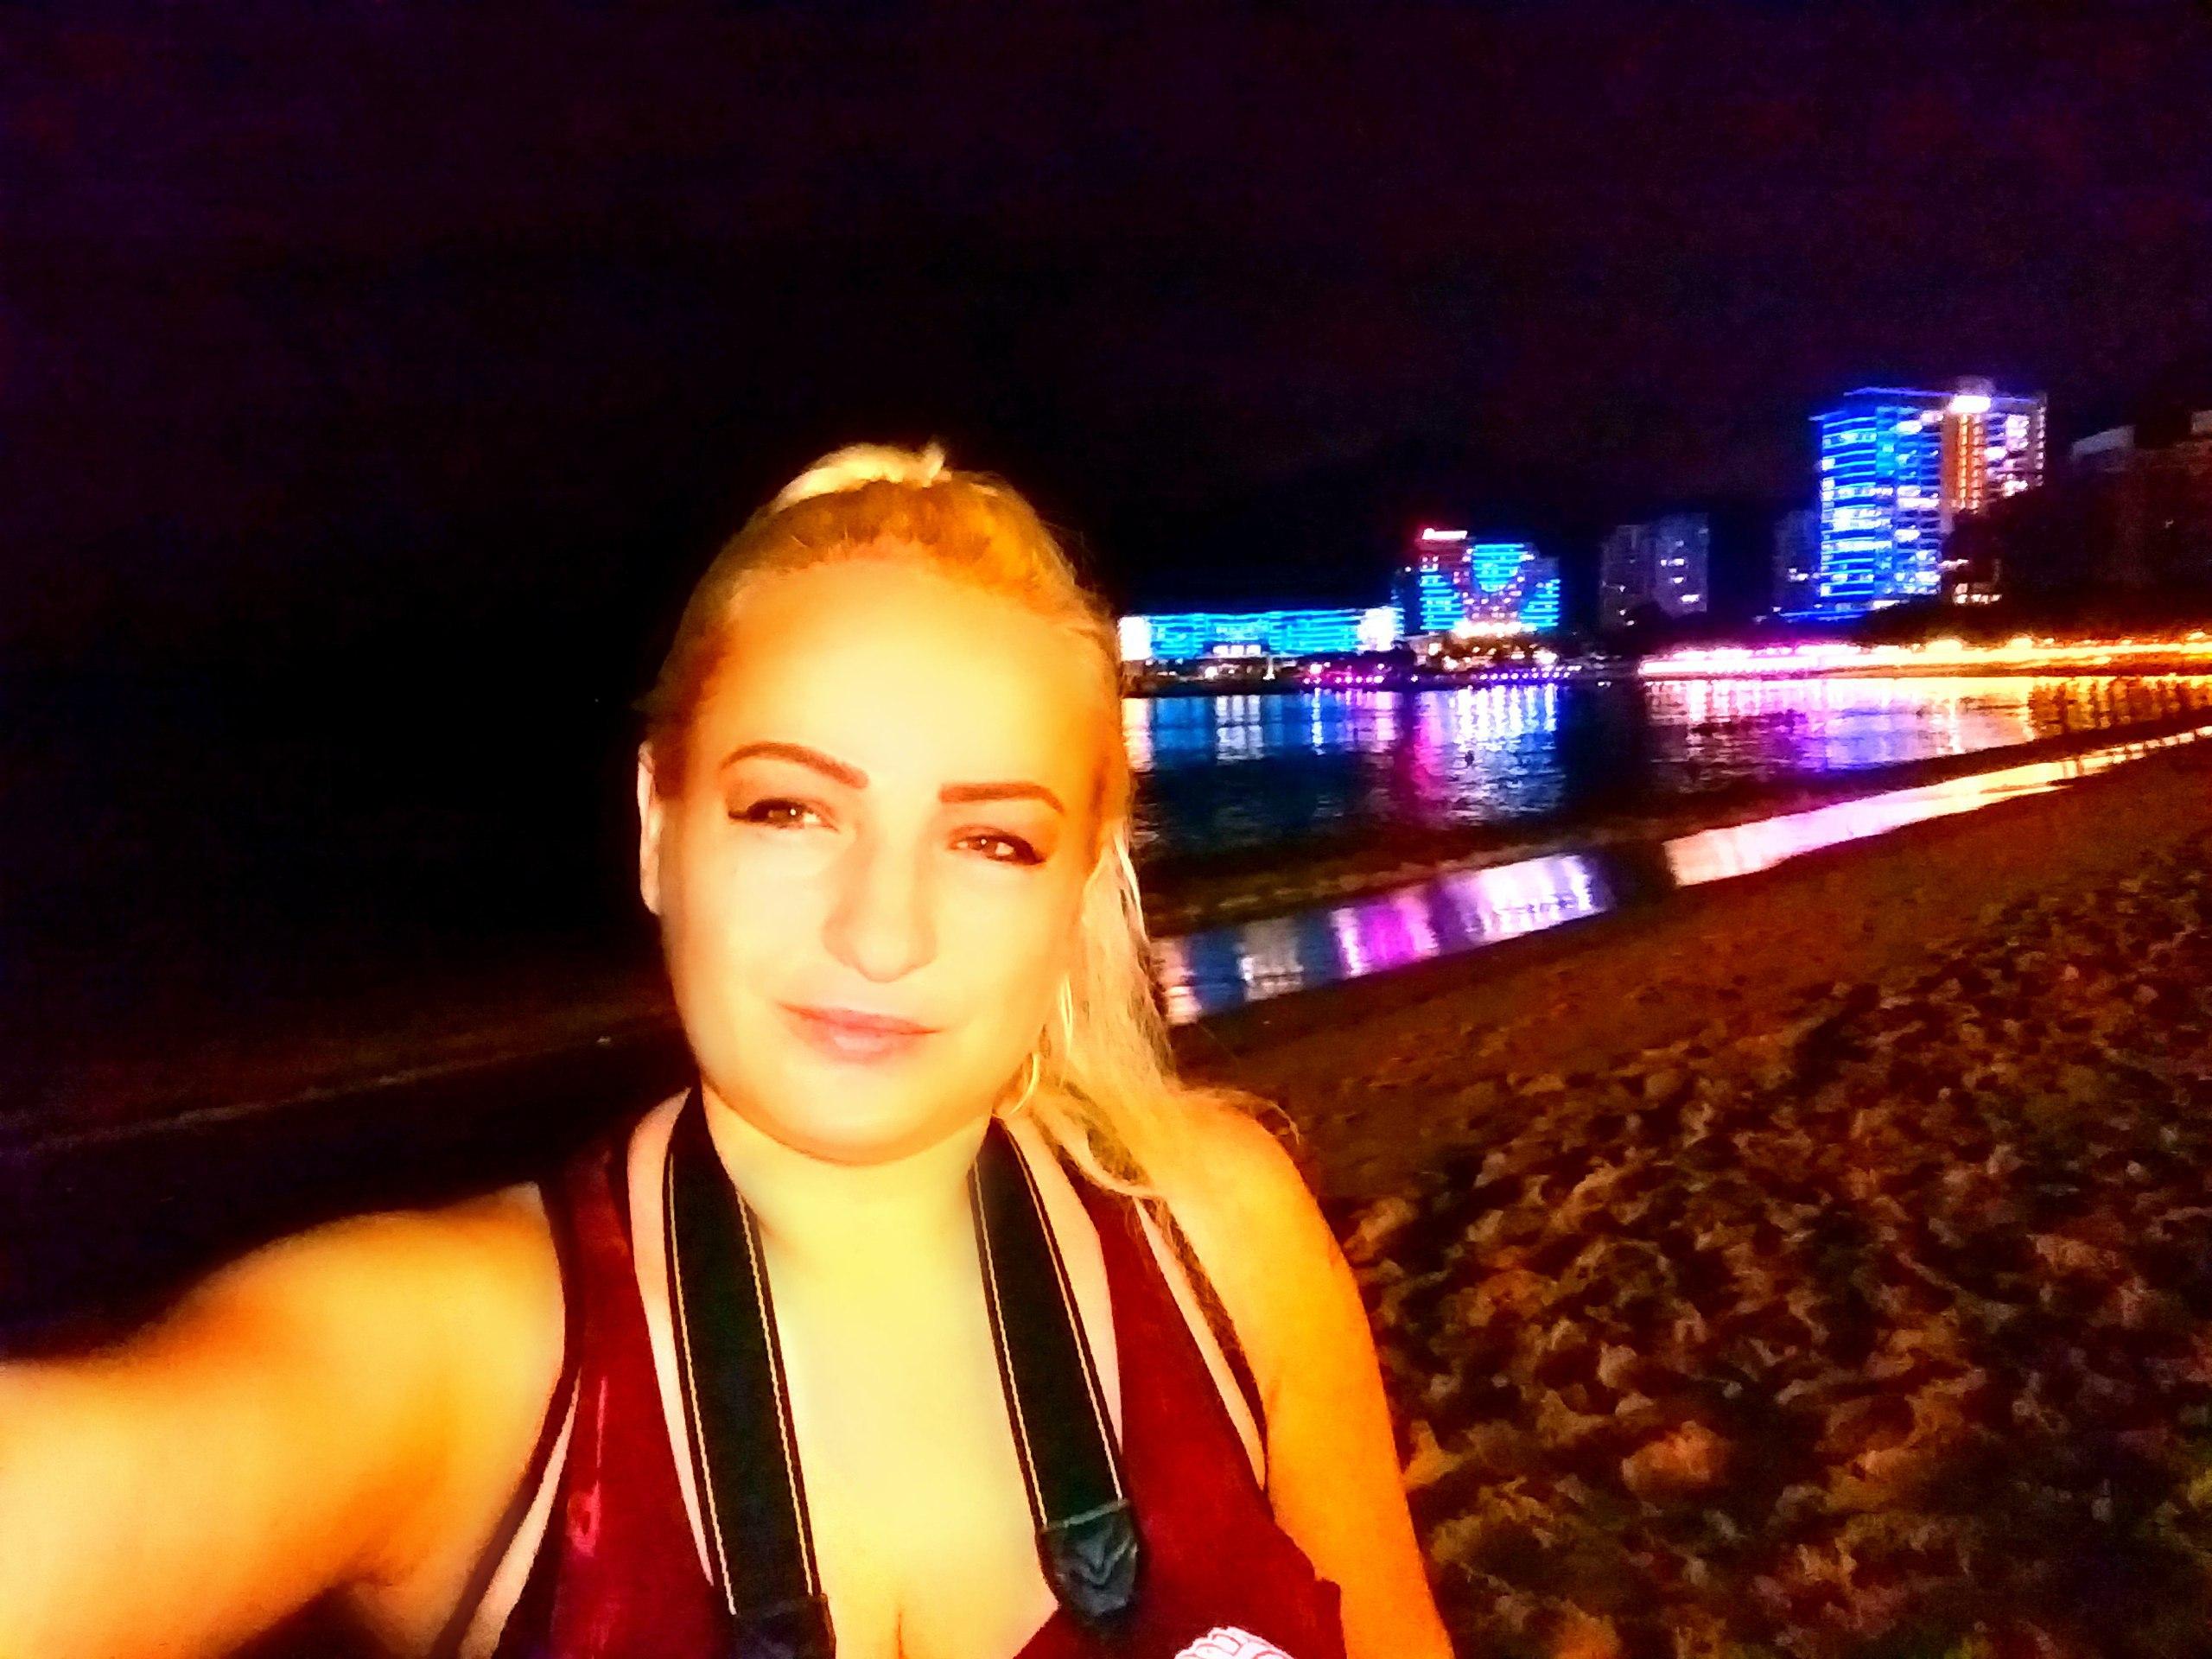 Хештег ночь на   Салон Магии и мистики Елены Руденко ( Валтеи ). Киев ,тел: 0506251562  XgaotQeSxxg